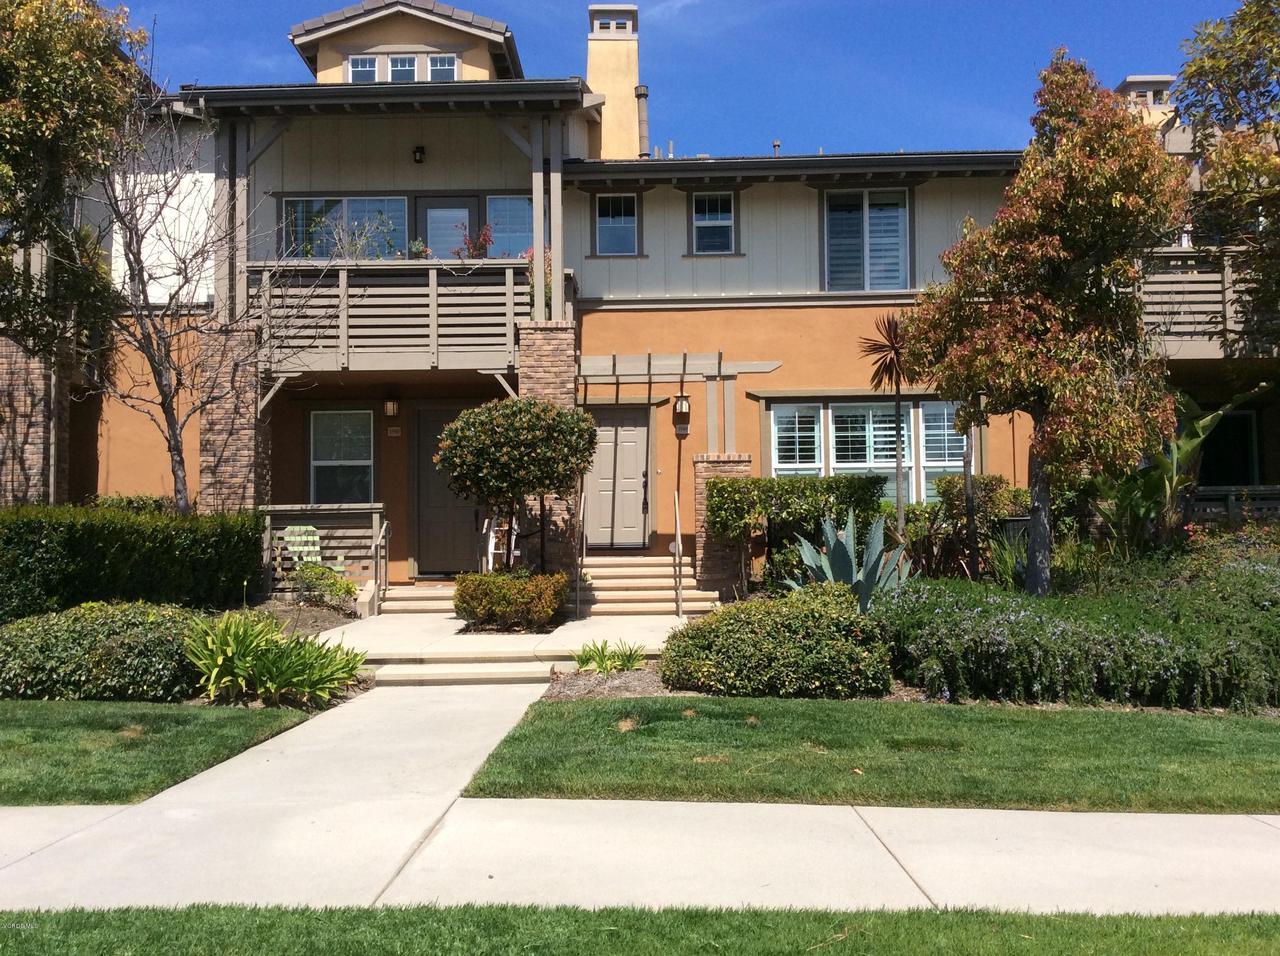 1548 Windshore Way, Oxnard, California